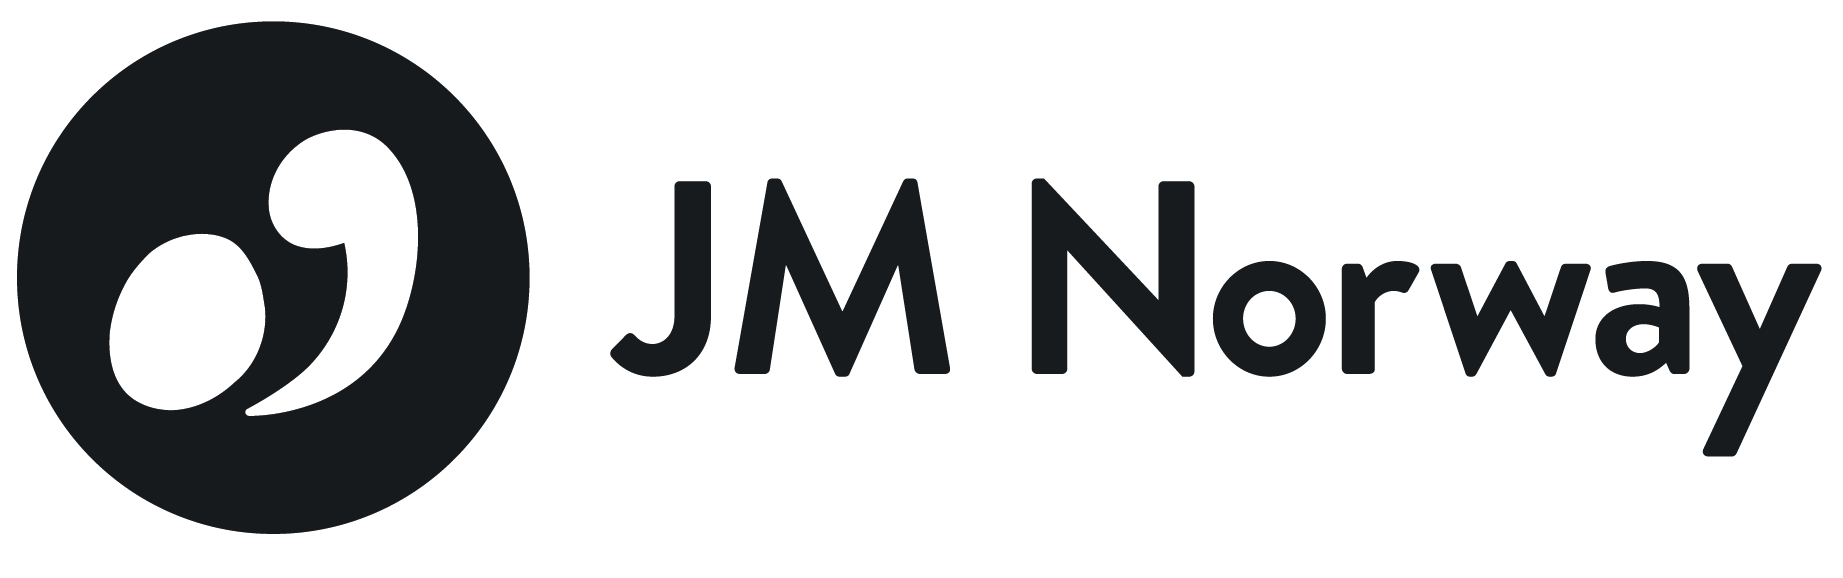 JM-Norway-Logos-All_logo-national_black.png